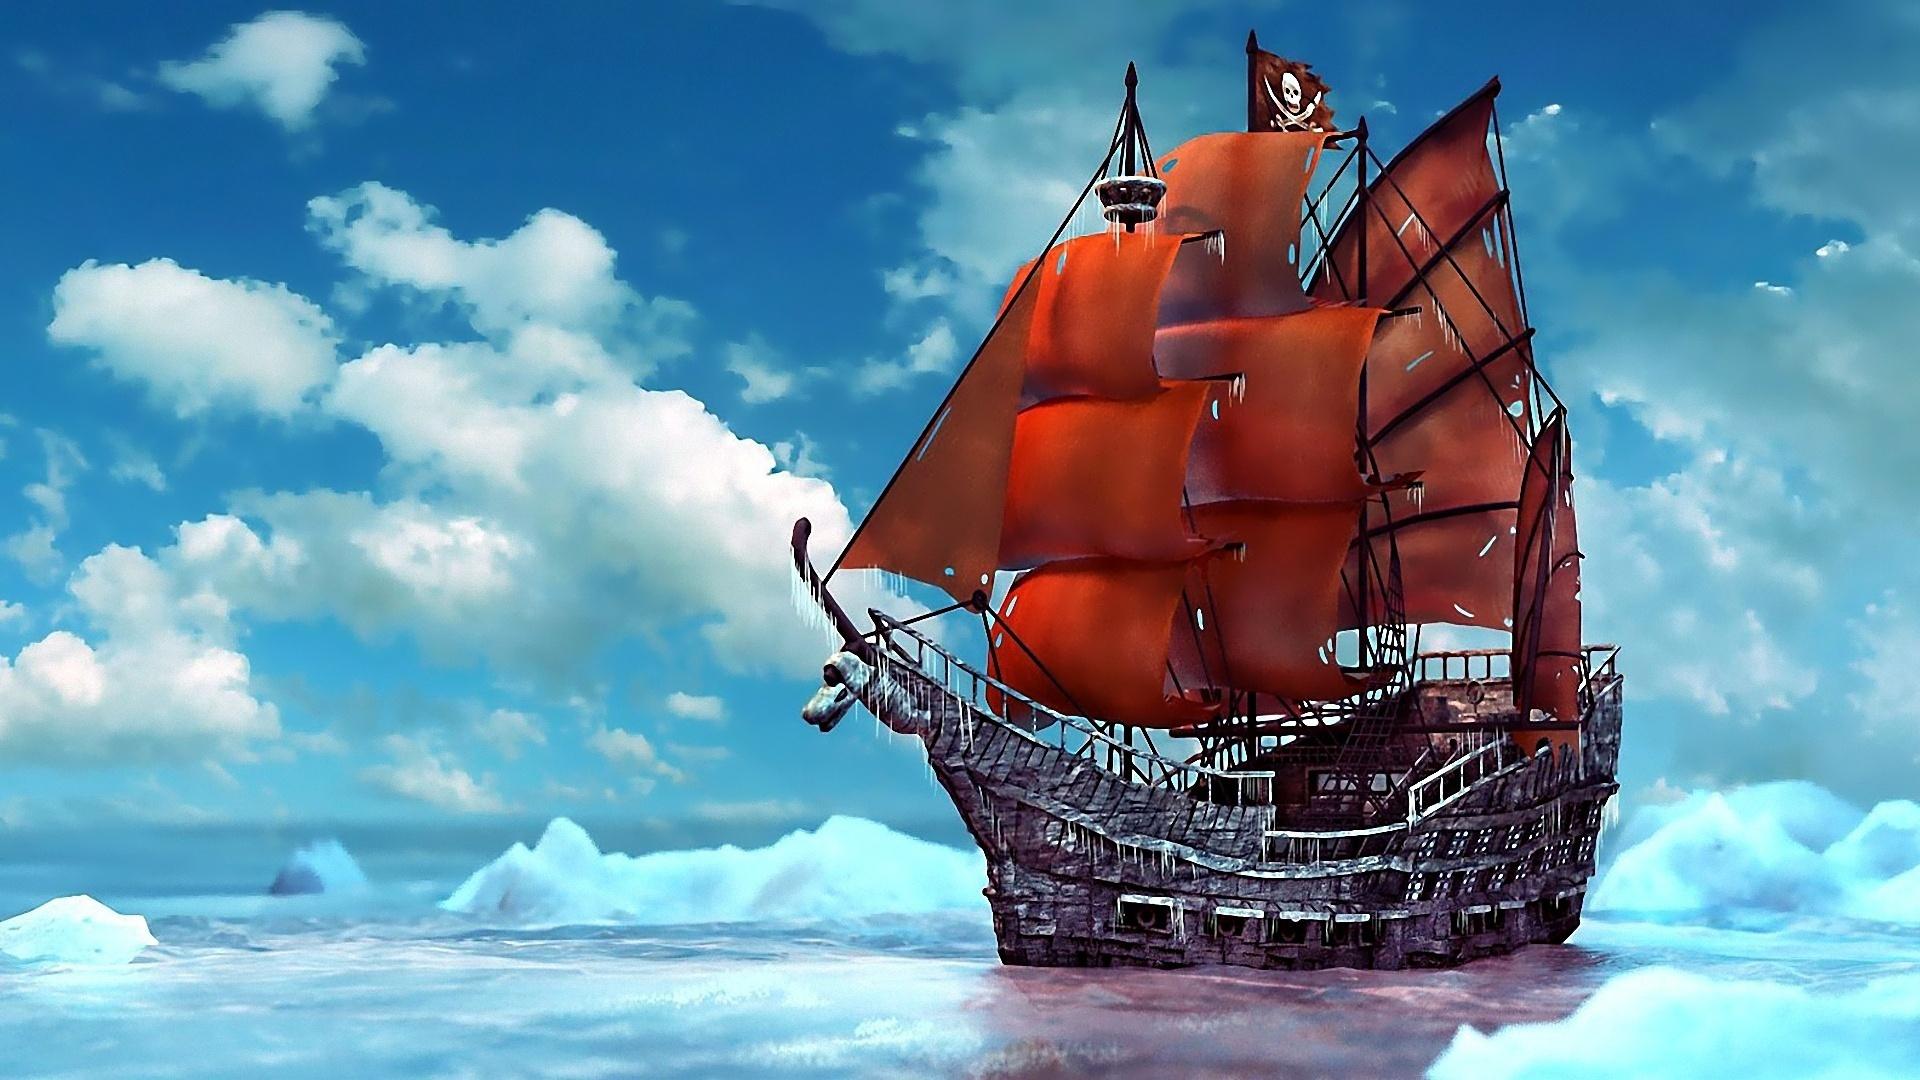 ... pirates ocean sea fantasy wallpaper | 1920x1080 | 91229 | WallpaperUP